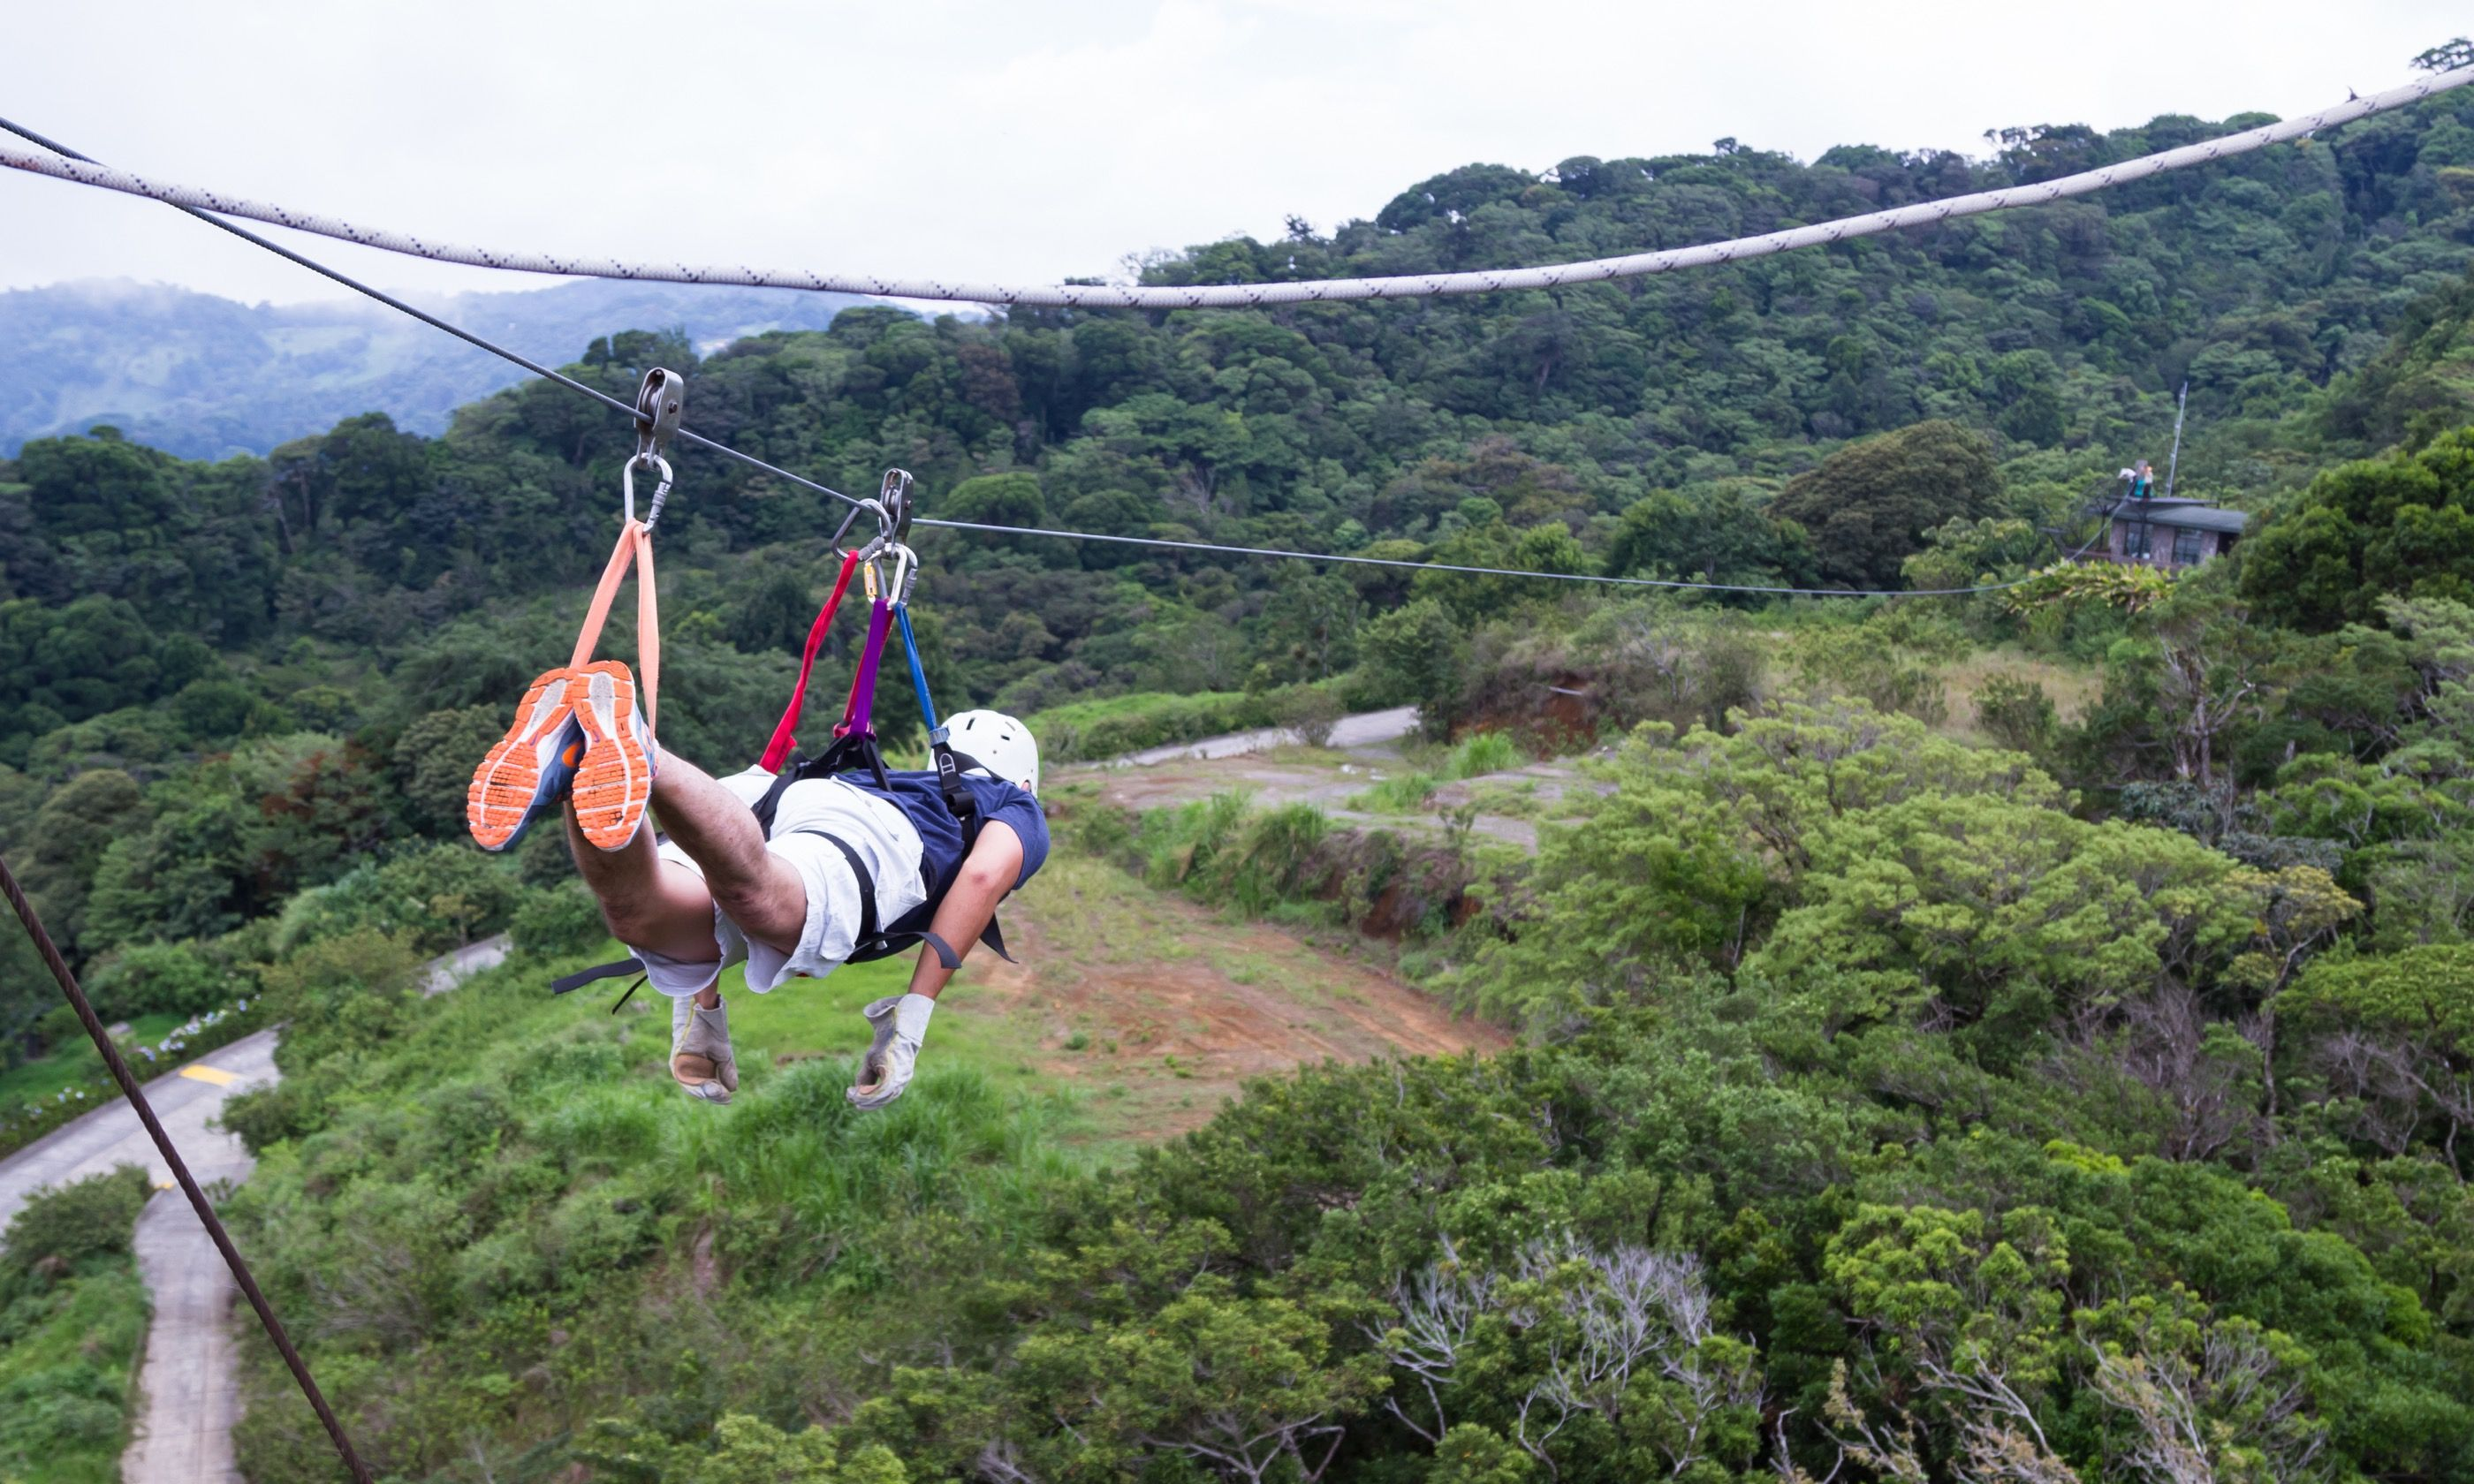 Ziplining in Costa Rica (Dreamstime)